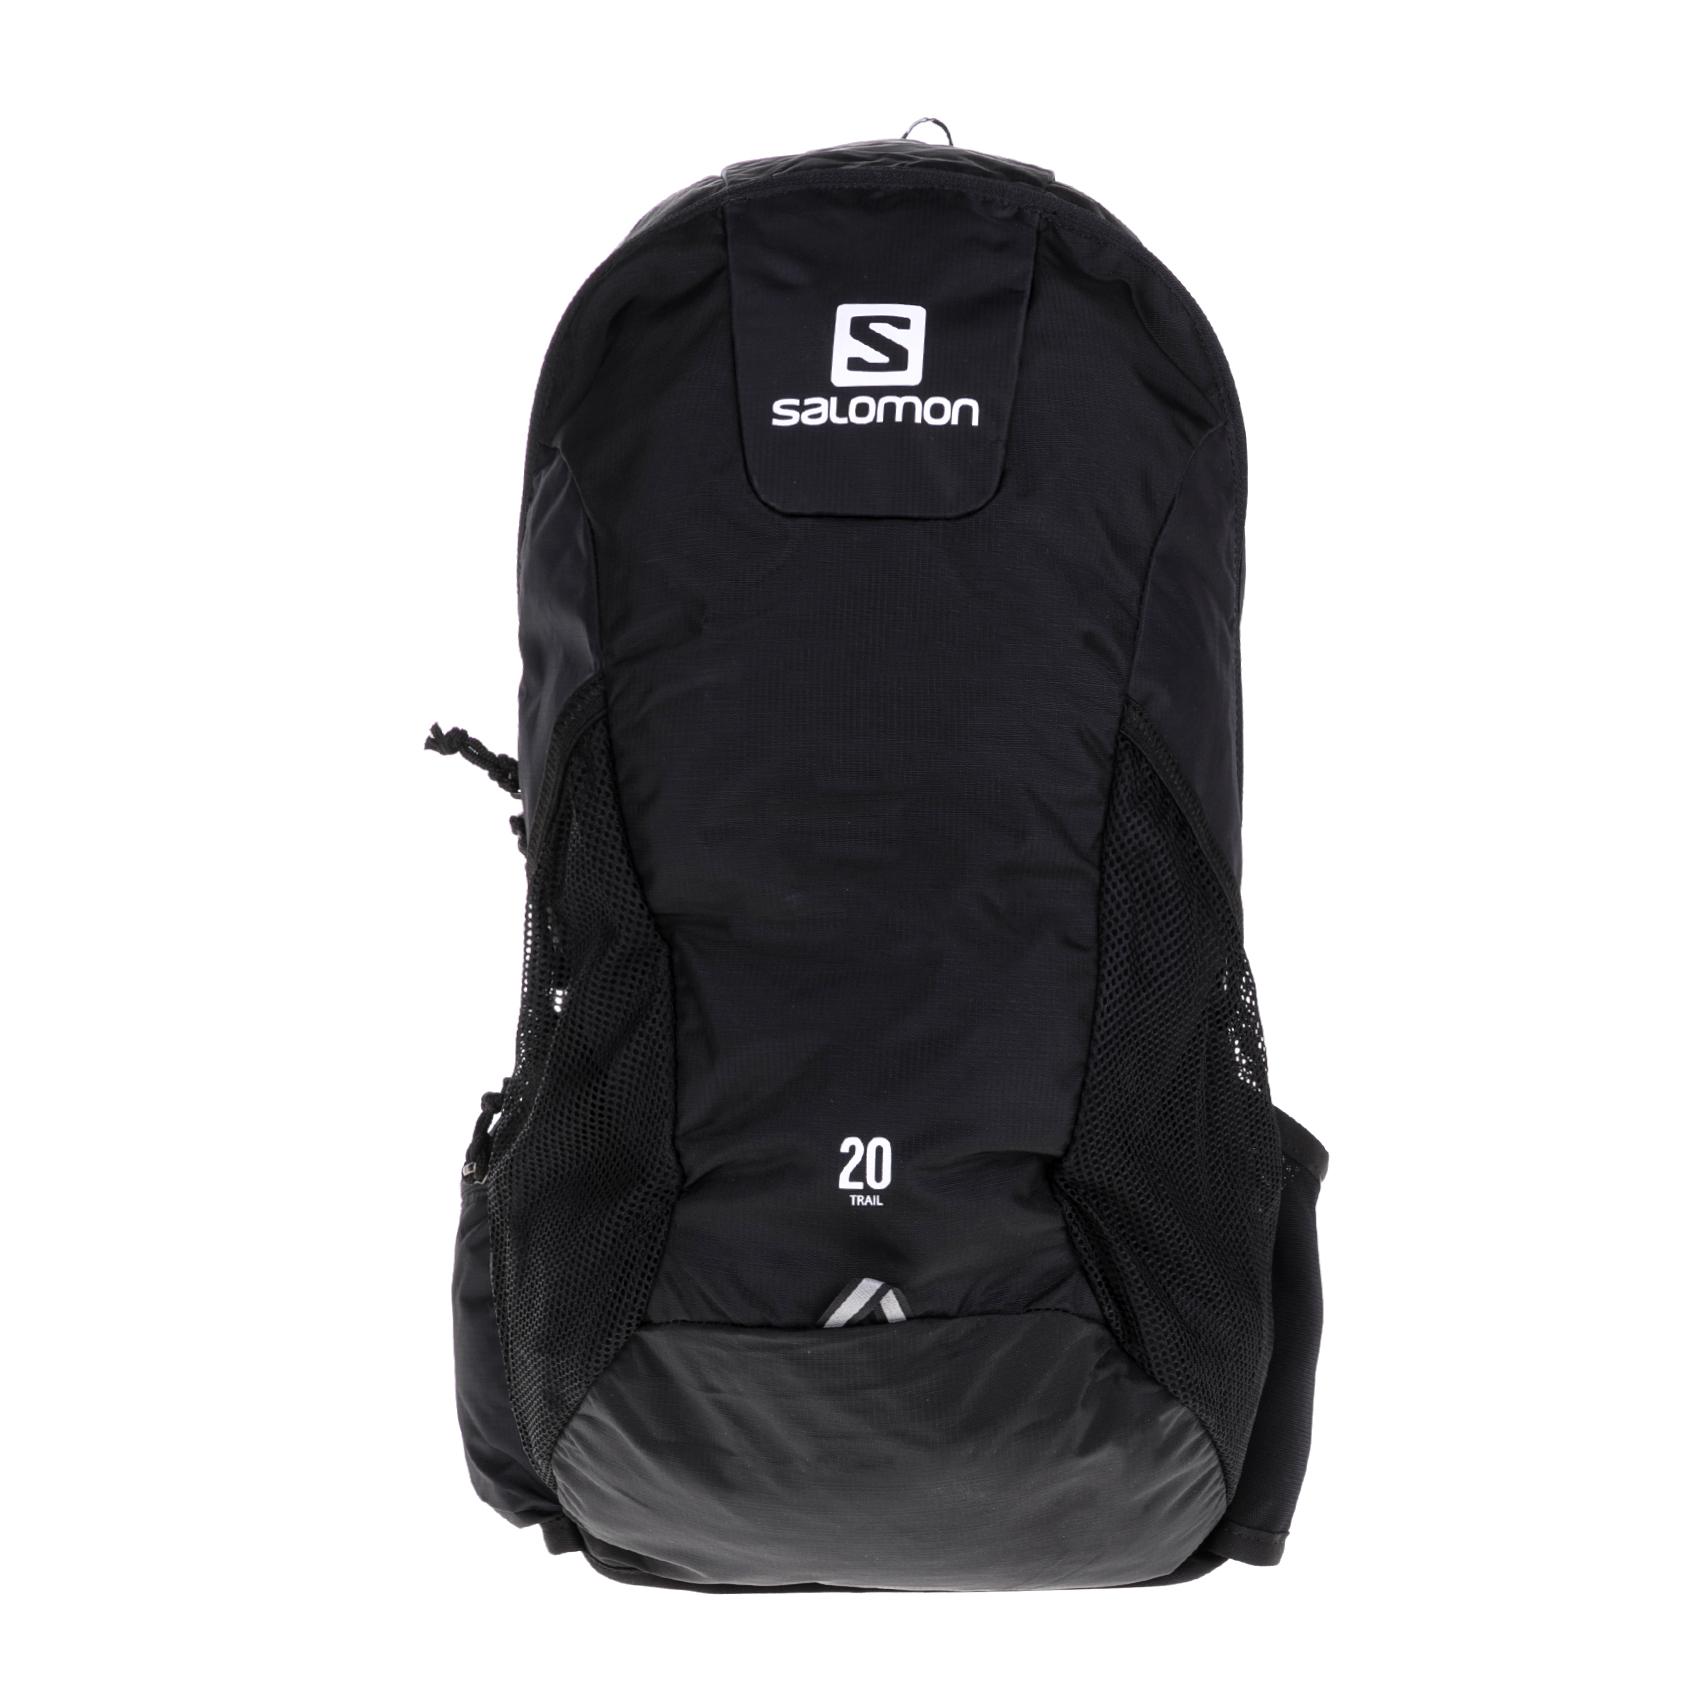 SALOMON – Σακίδιο πλάτης SALOMON PACKS BAG TRAIL 20 B μαύρο